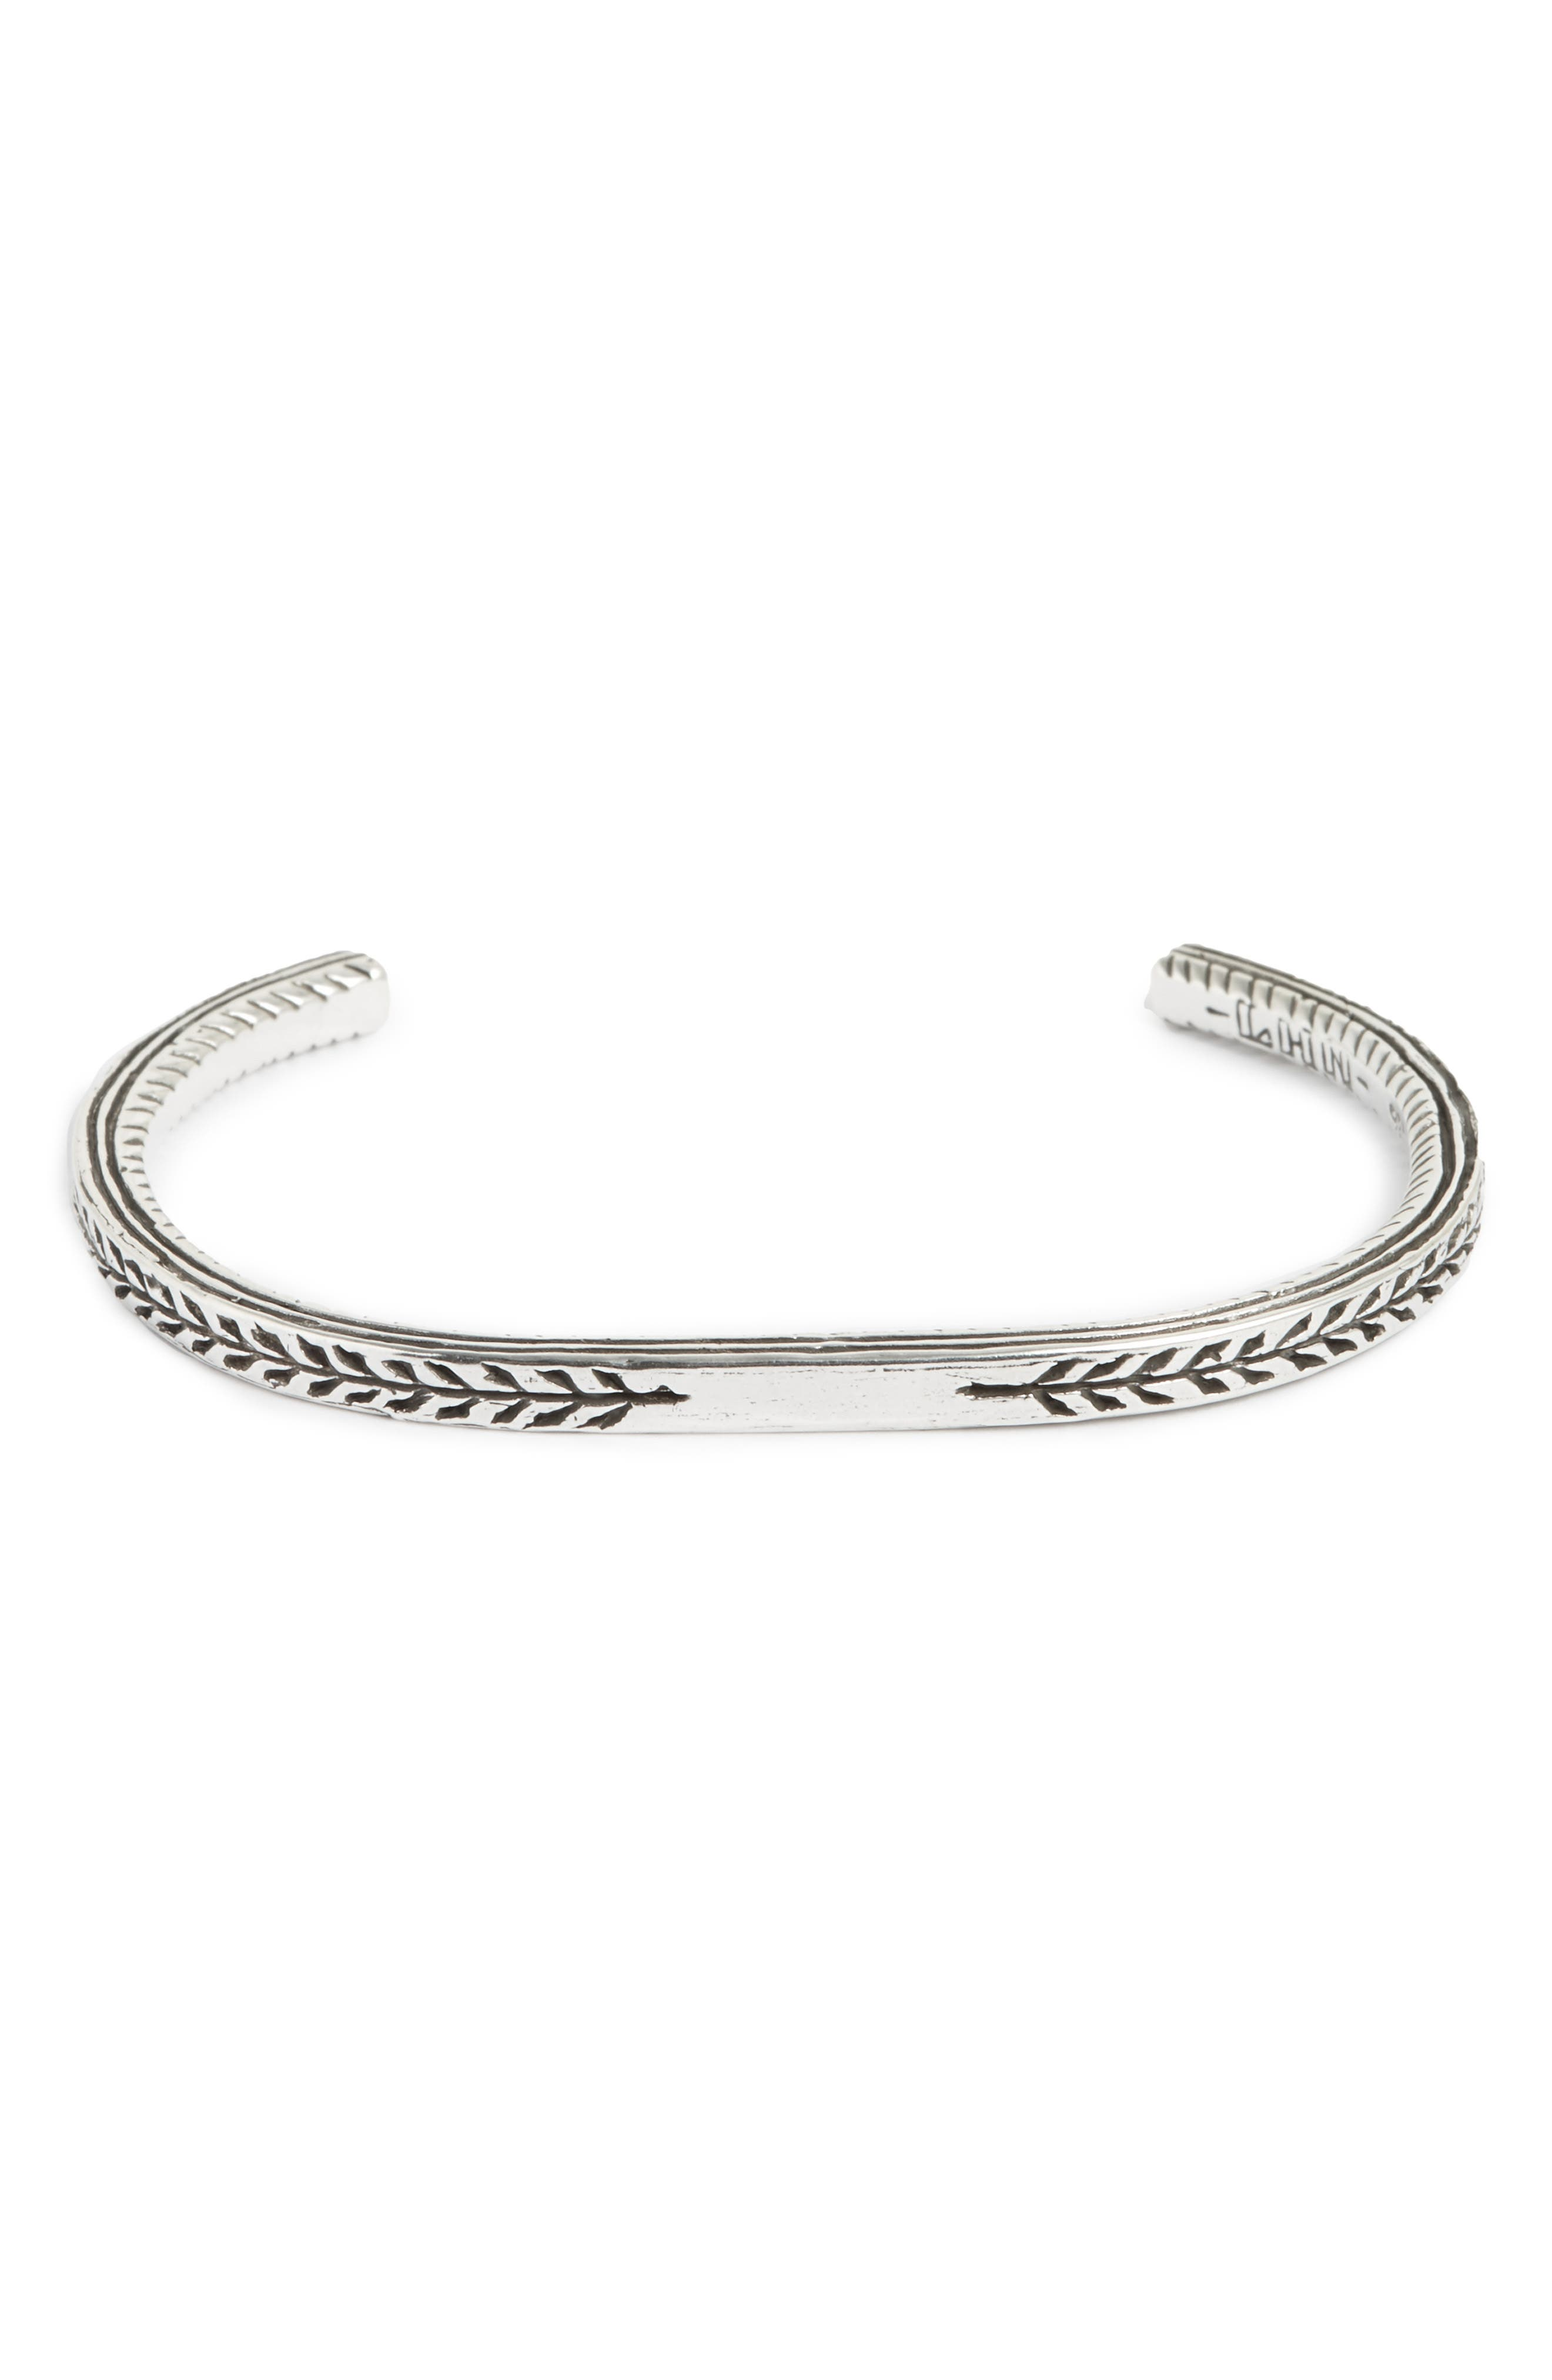 Main Image - Lewis Henry Nicholas Pantheon Sterling Silver Cuff Bracelet